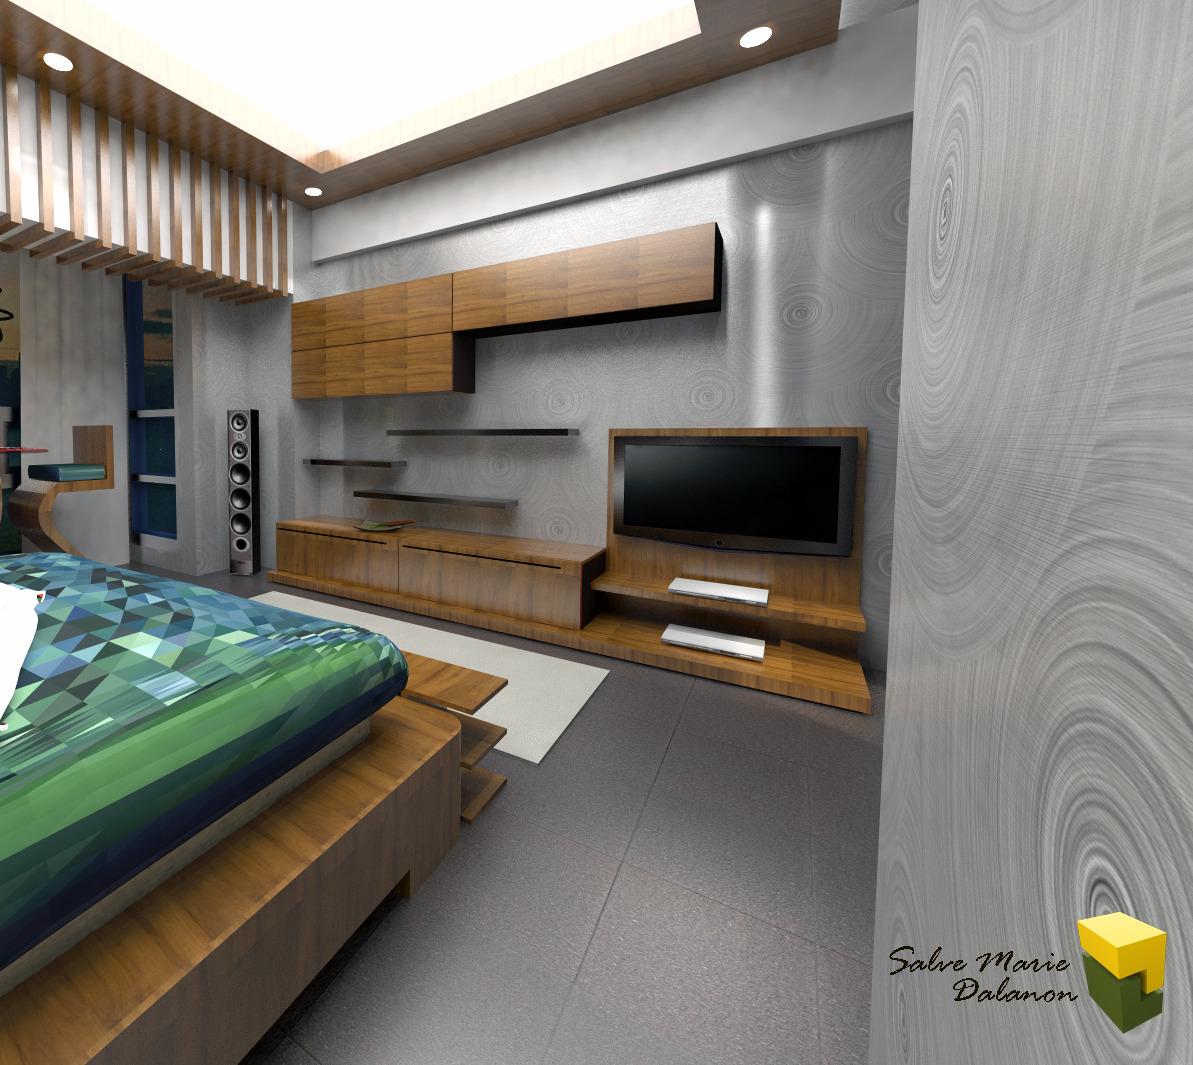 Various proposals salve marie dalanon archinect for Studio type condo design